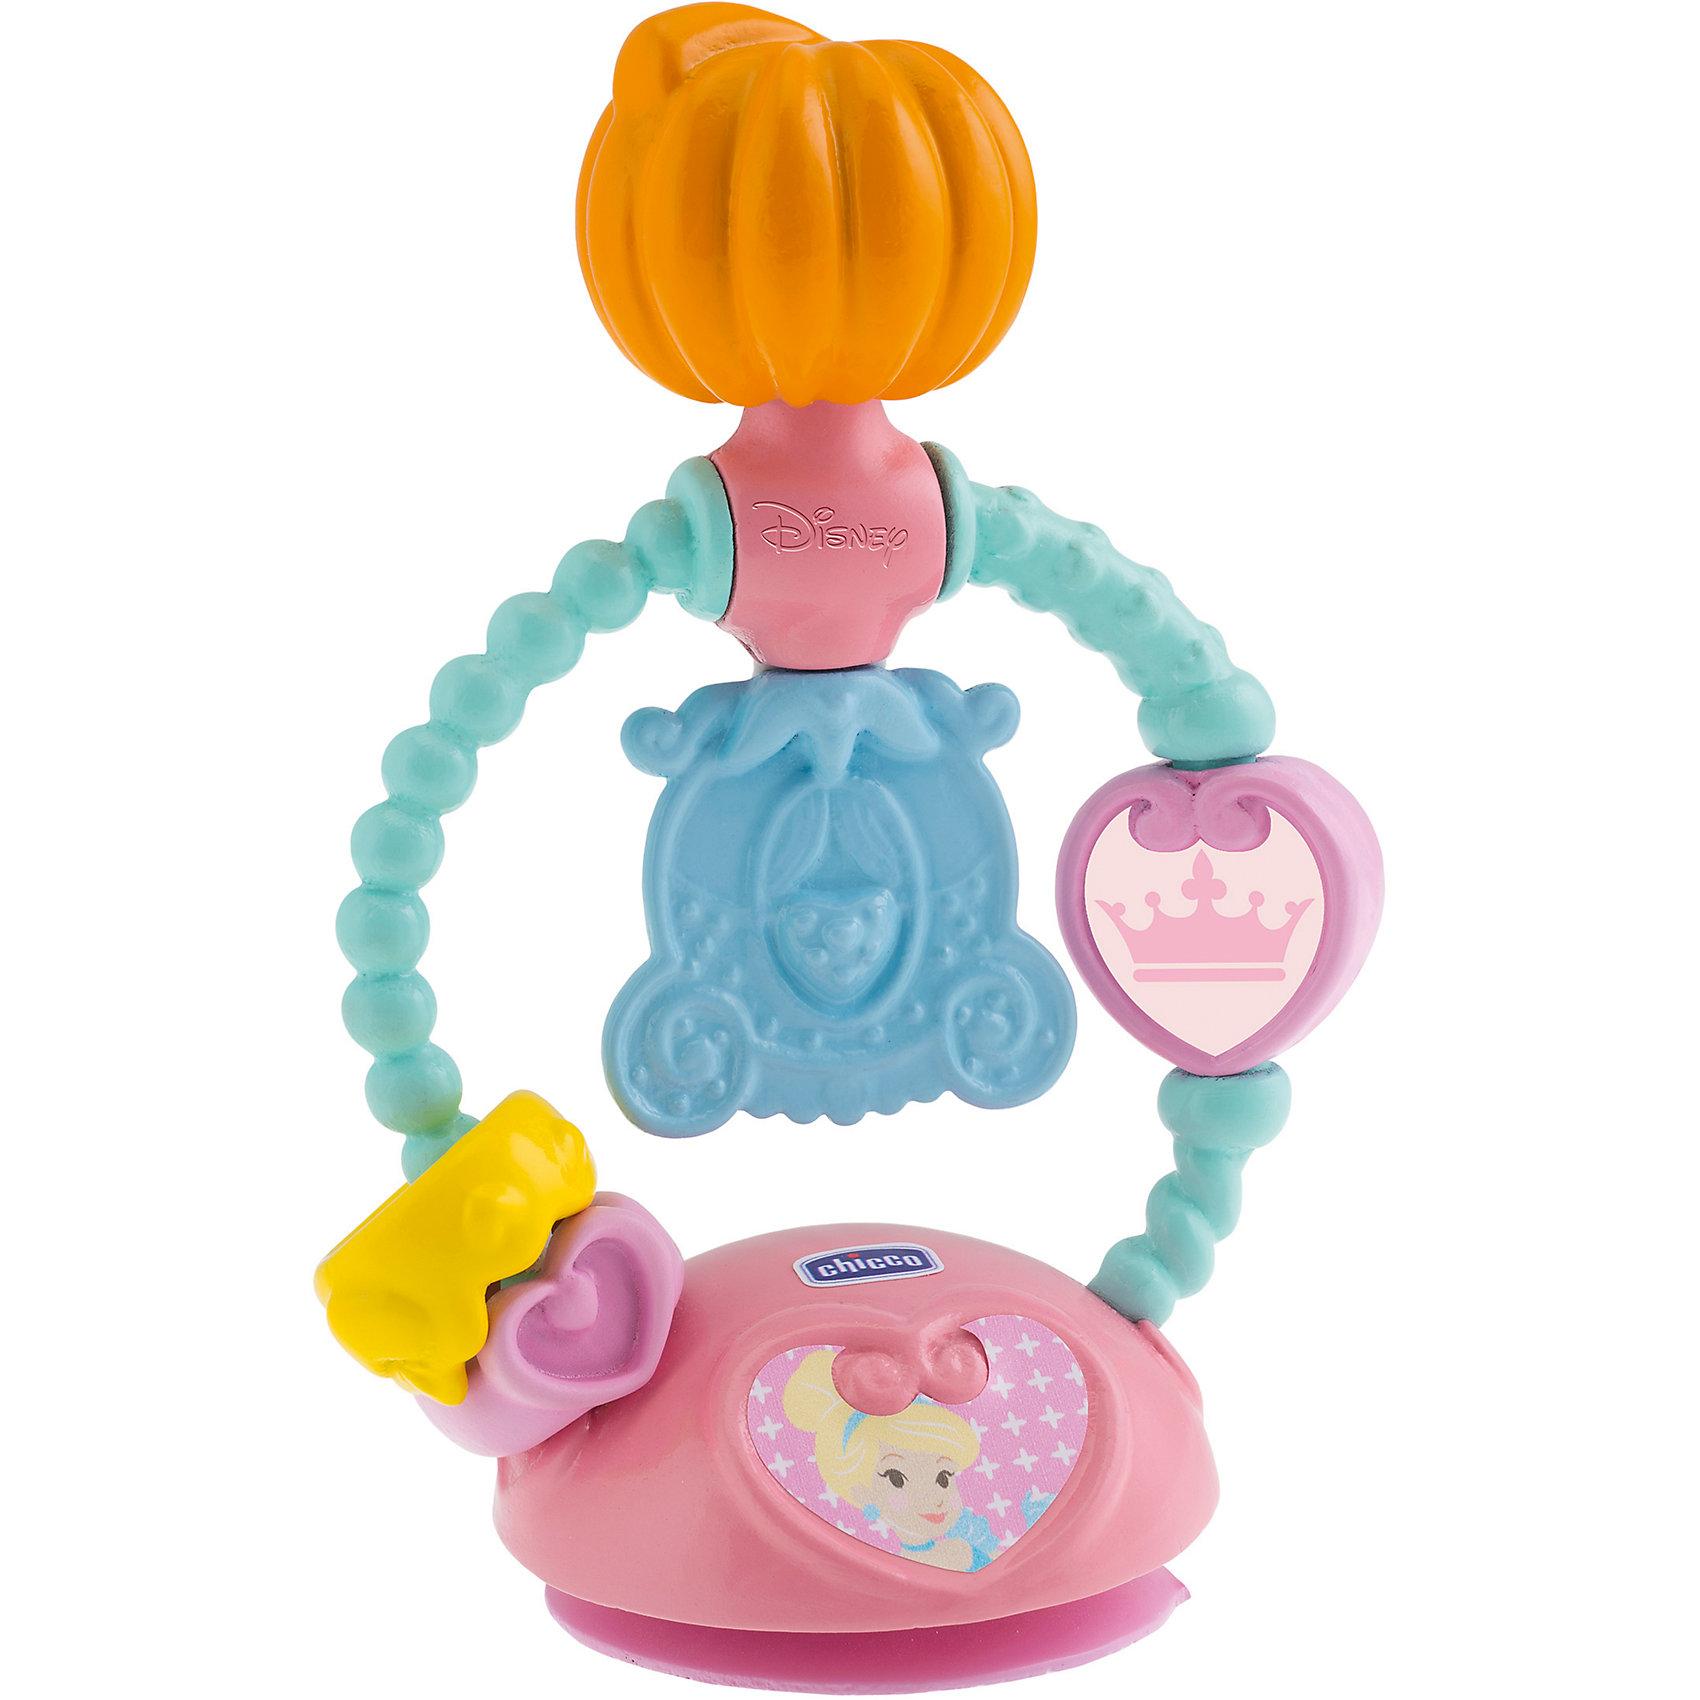 CHICCO Игрушка для стульчика Золушка, Chicco игрушка подвеска chicco игрушка мягкая для коляски золушка